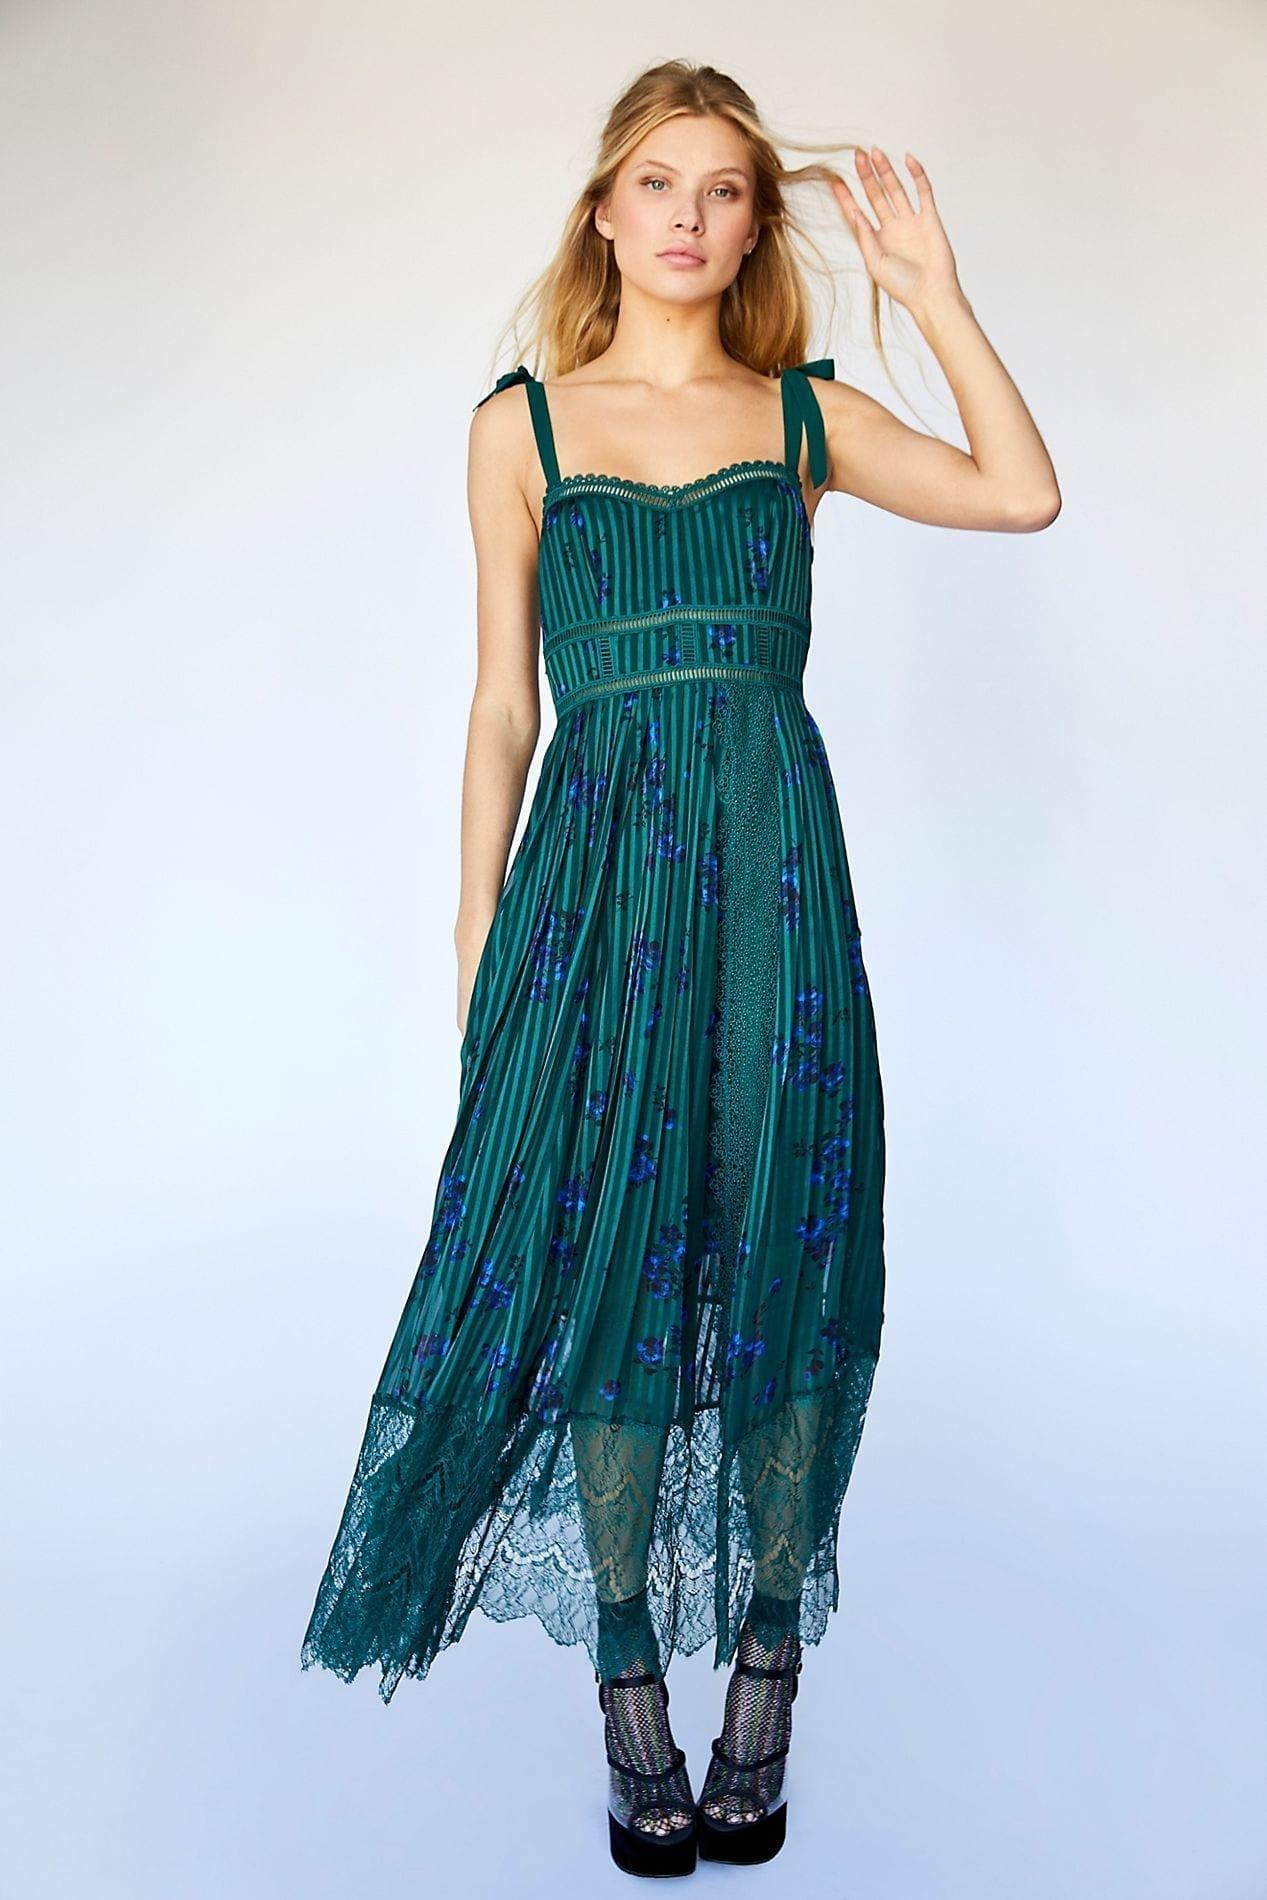 5a610b0957 FREEPEOPLE Seven Wonders Maxi Green Dress - We Select Dresses